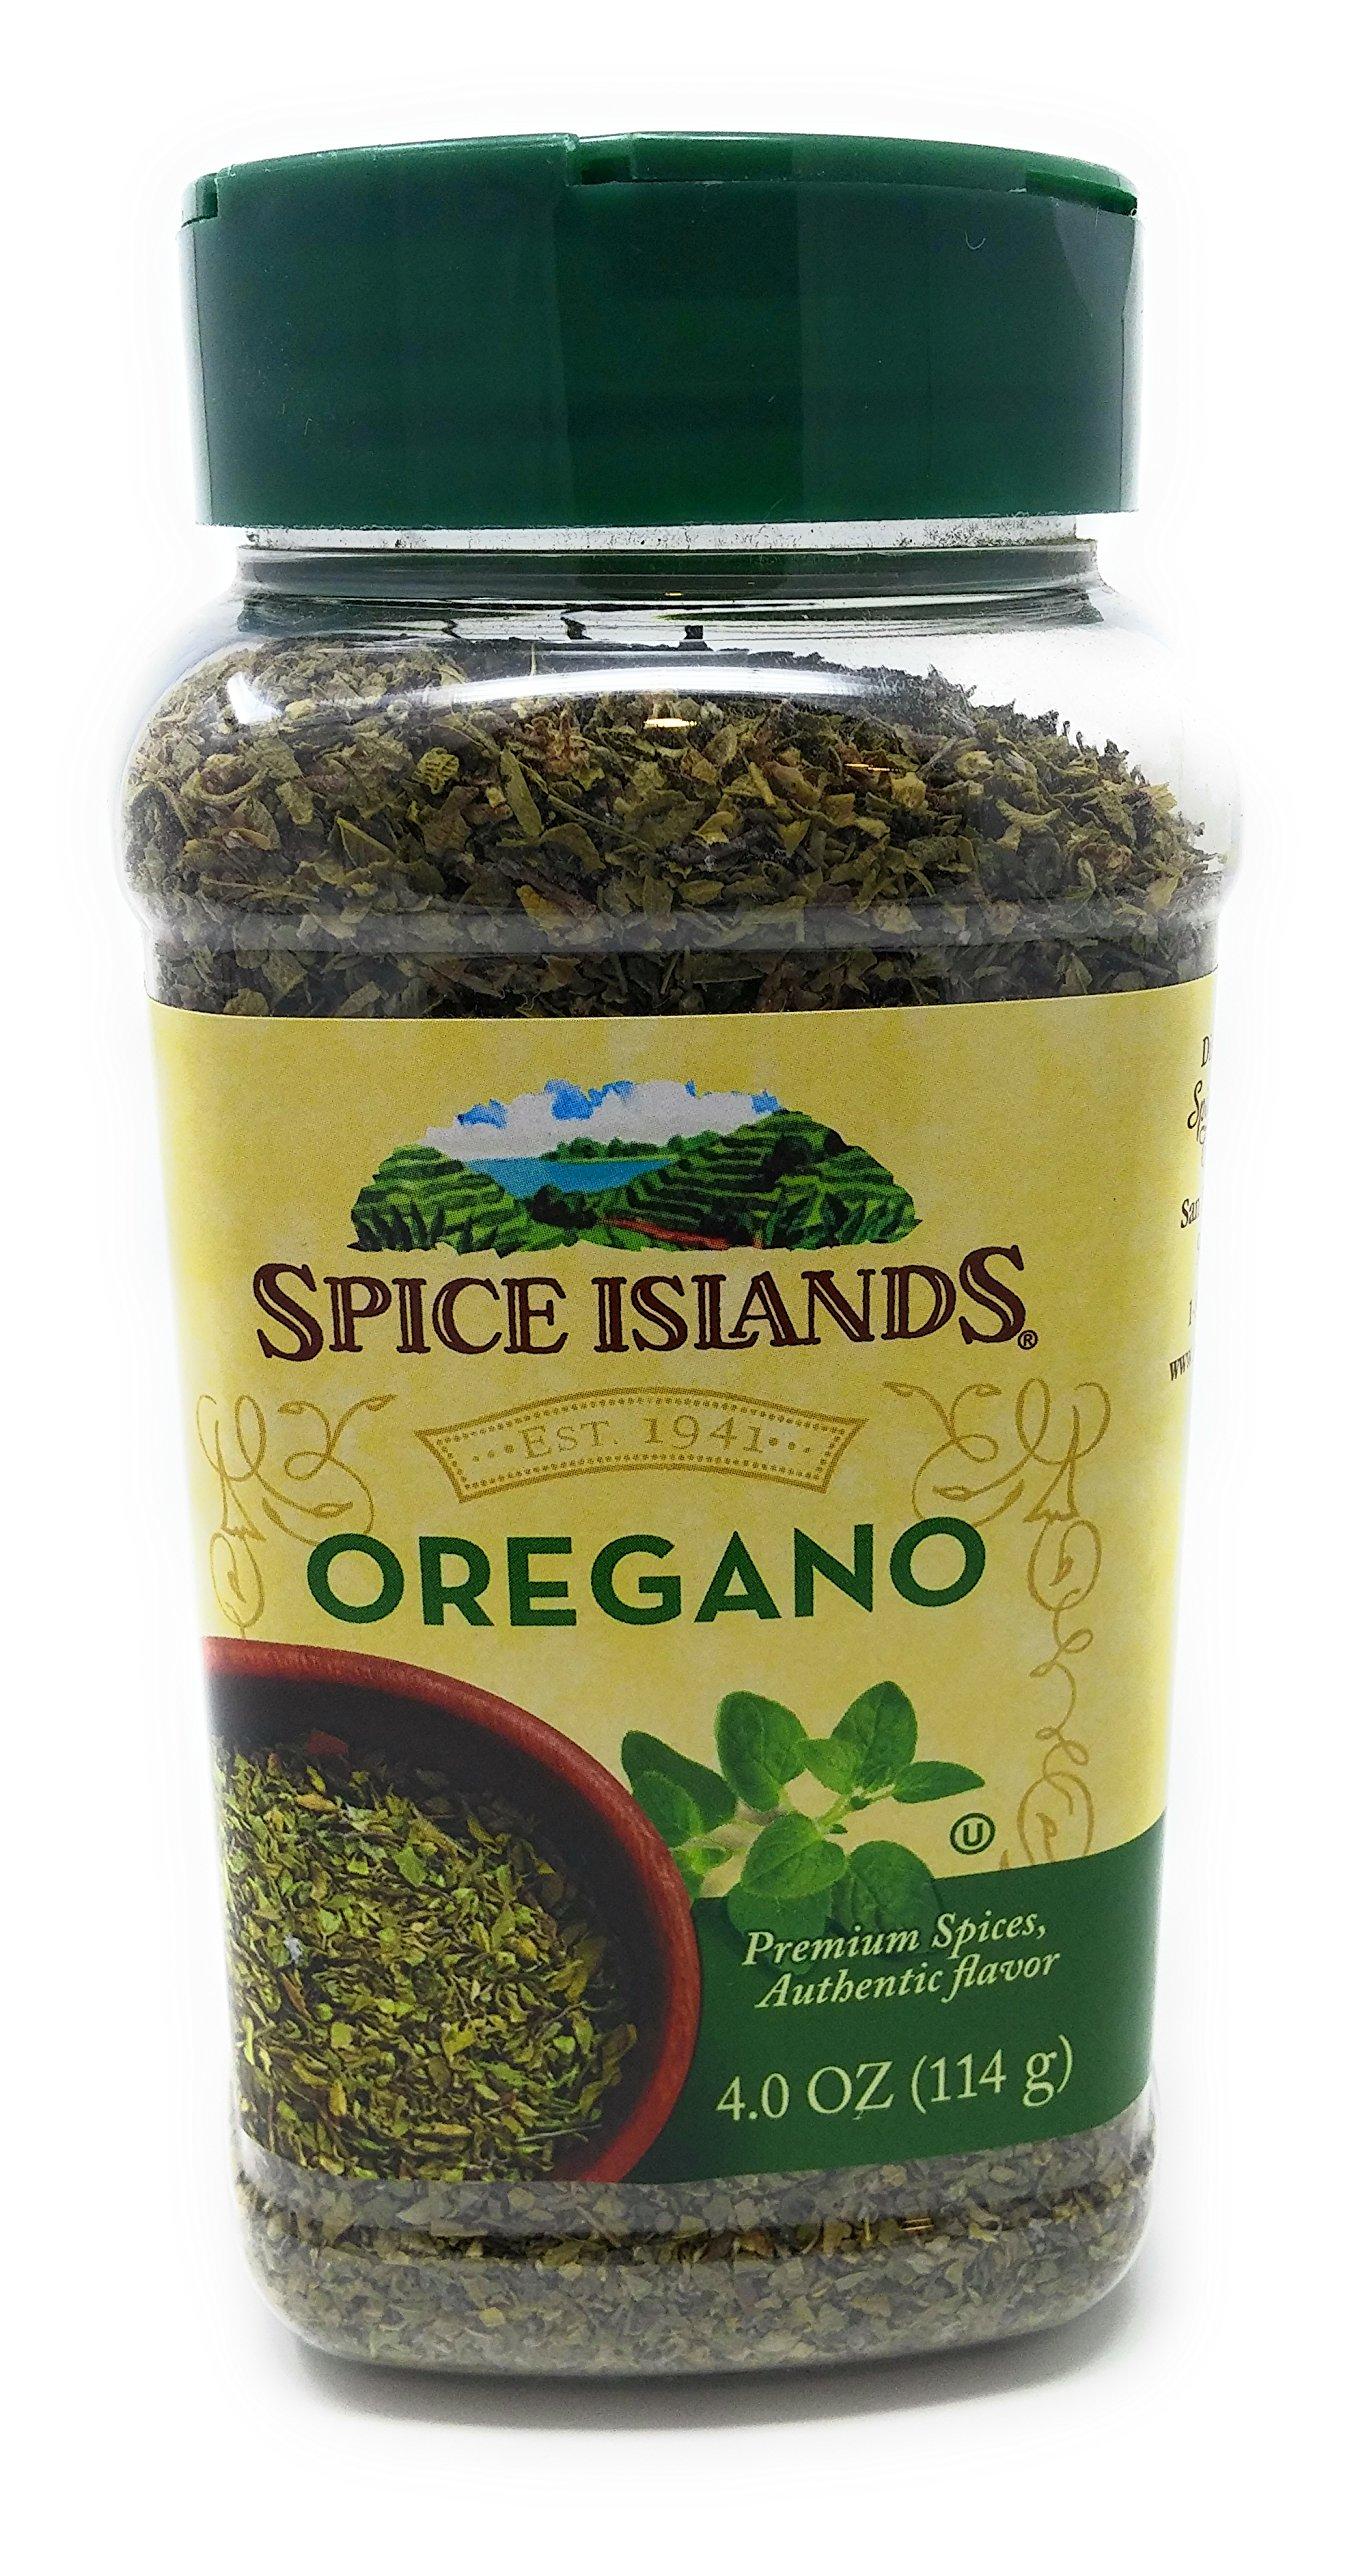 Spice Island Oregano 4 Ounce Container - Premium Spices, Authentic Flavor